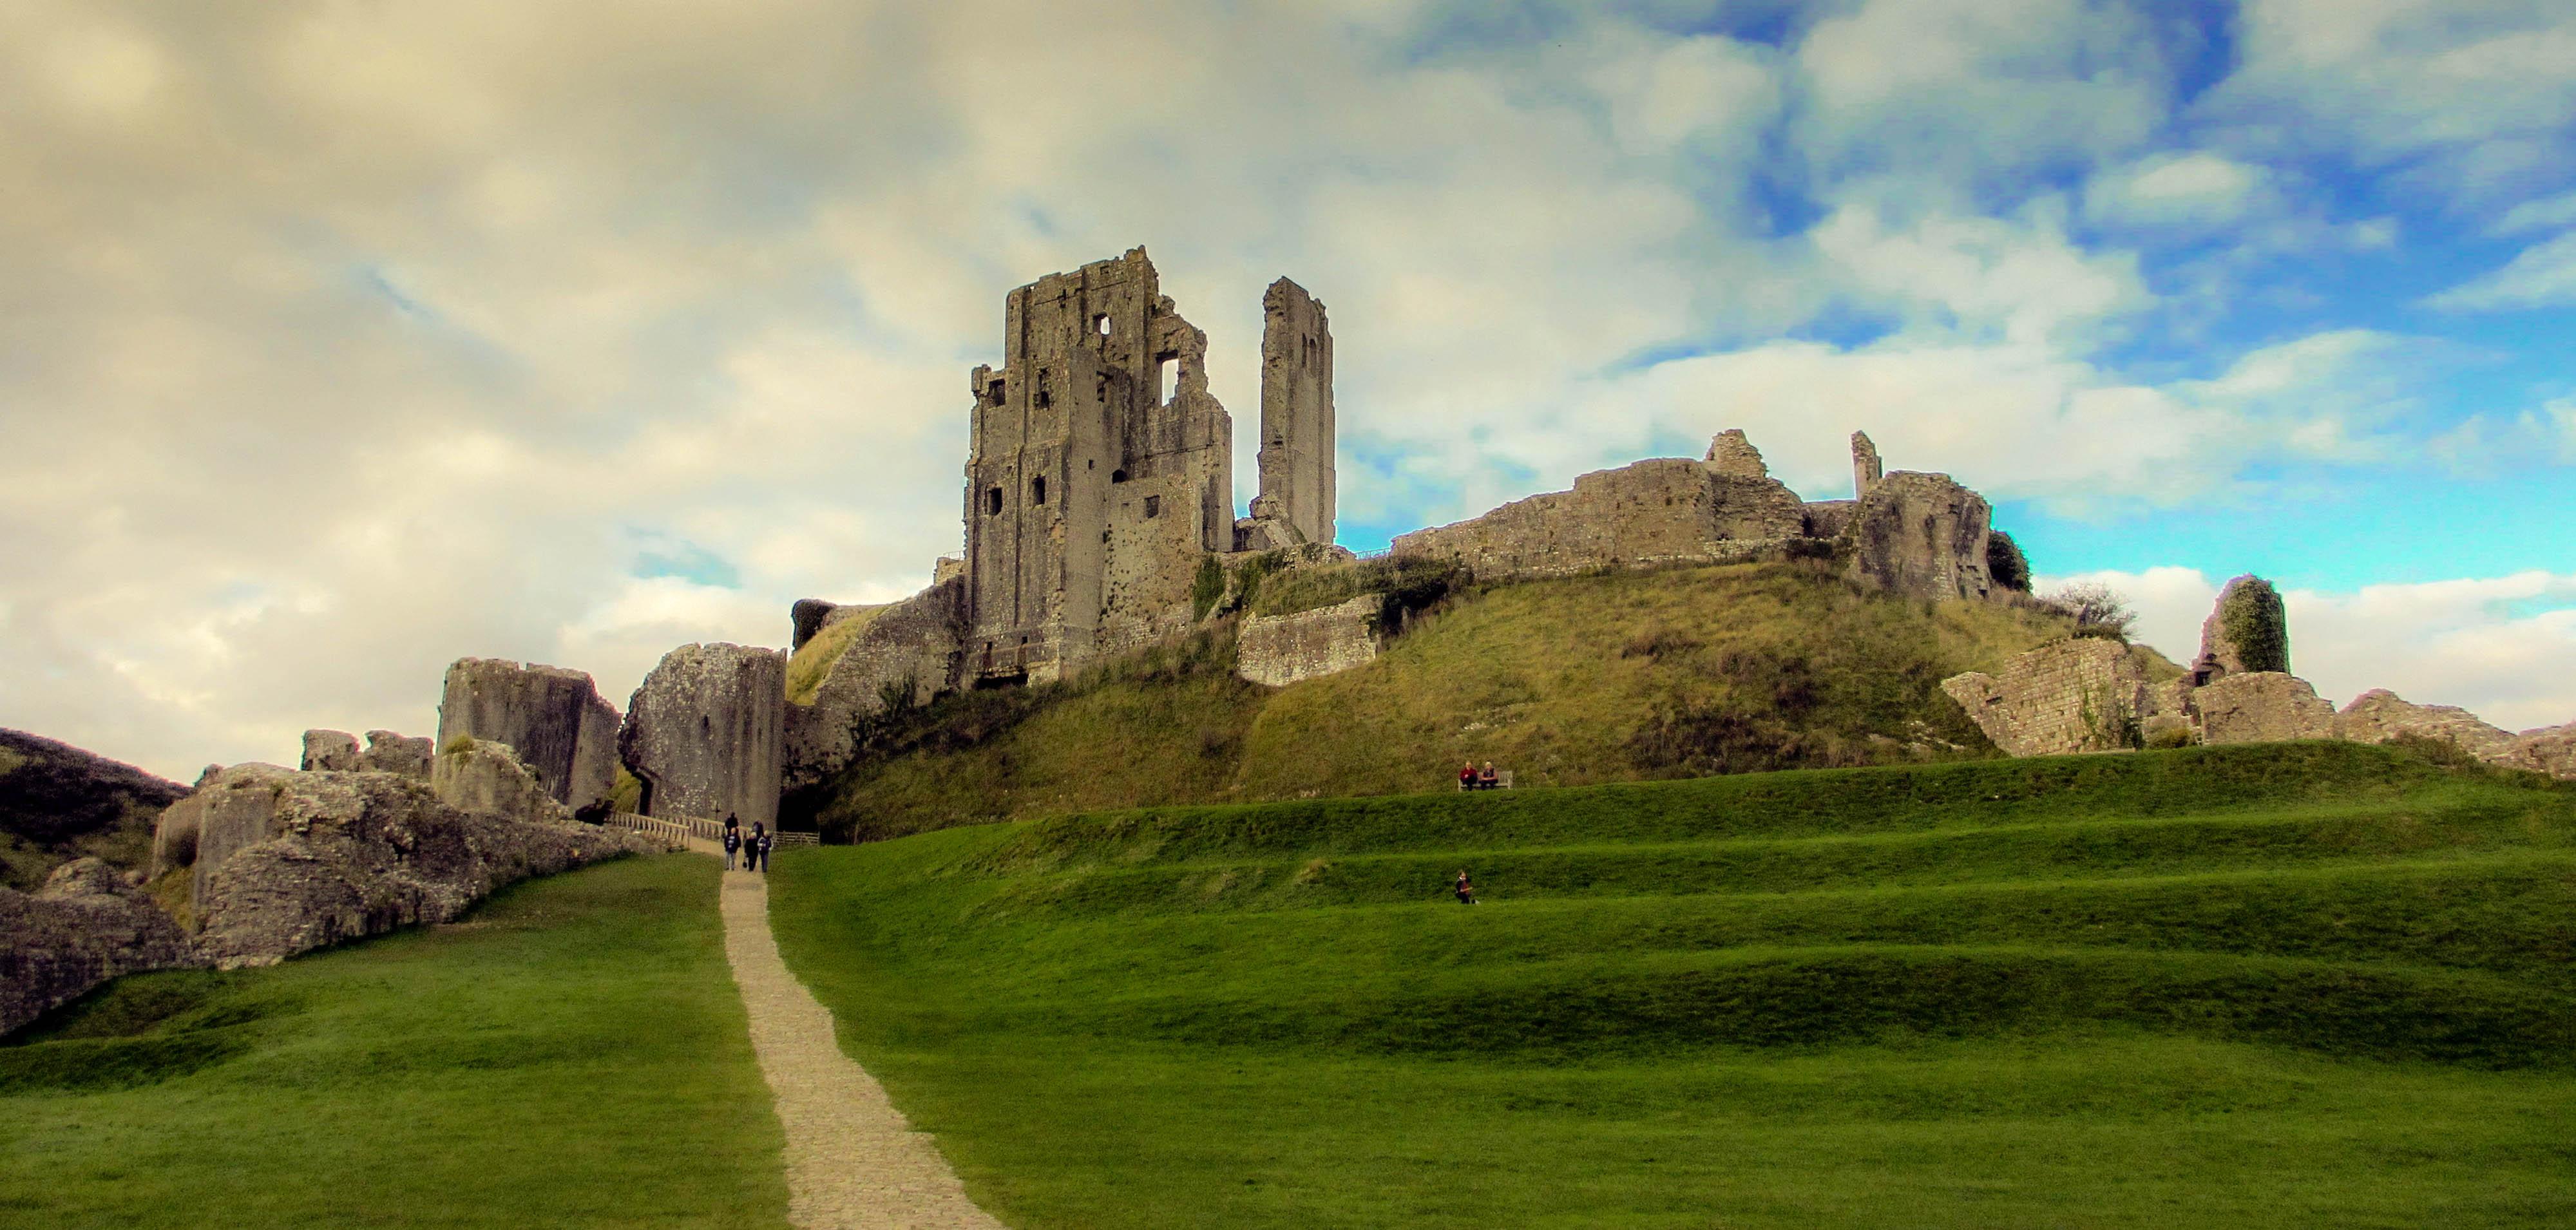 how did the development of gunpowder affect castles